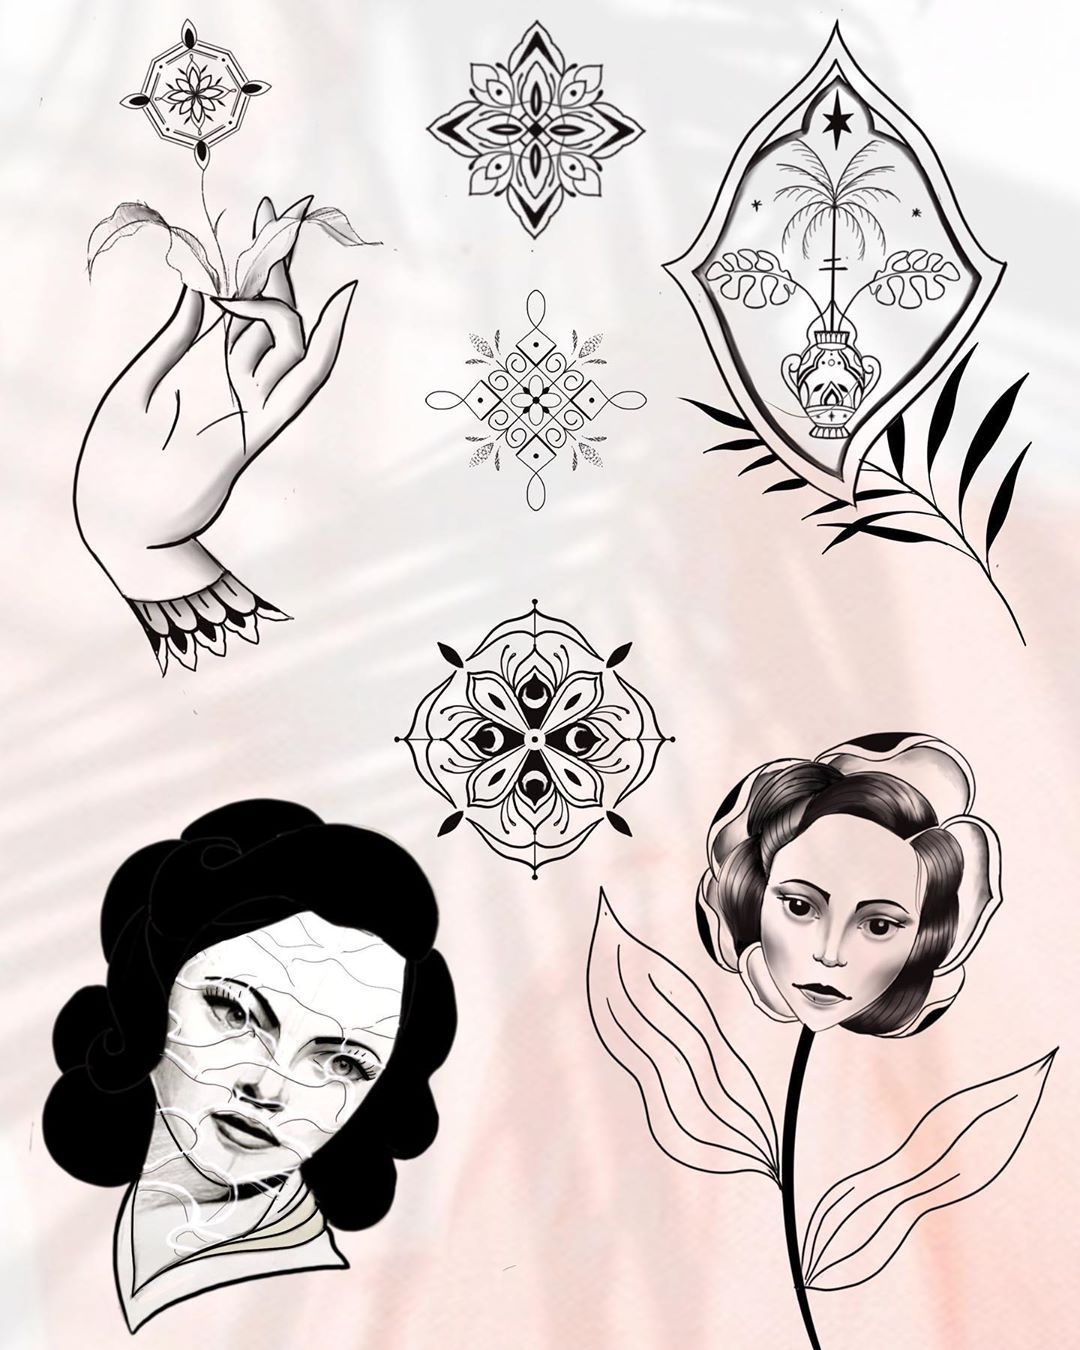 Pièces à adopter / available now #tattoo #design #oldschooltattoo #orientaltattoo #orientaldance #line #flashtattoo #tattooflash #art tattooer #ink #newage #newtattoo blackwork #vegetaltattoo #illustration #dailyart #ornamentaltattoo #surrealism